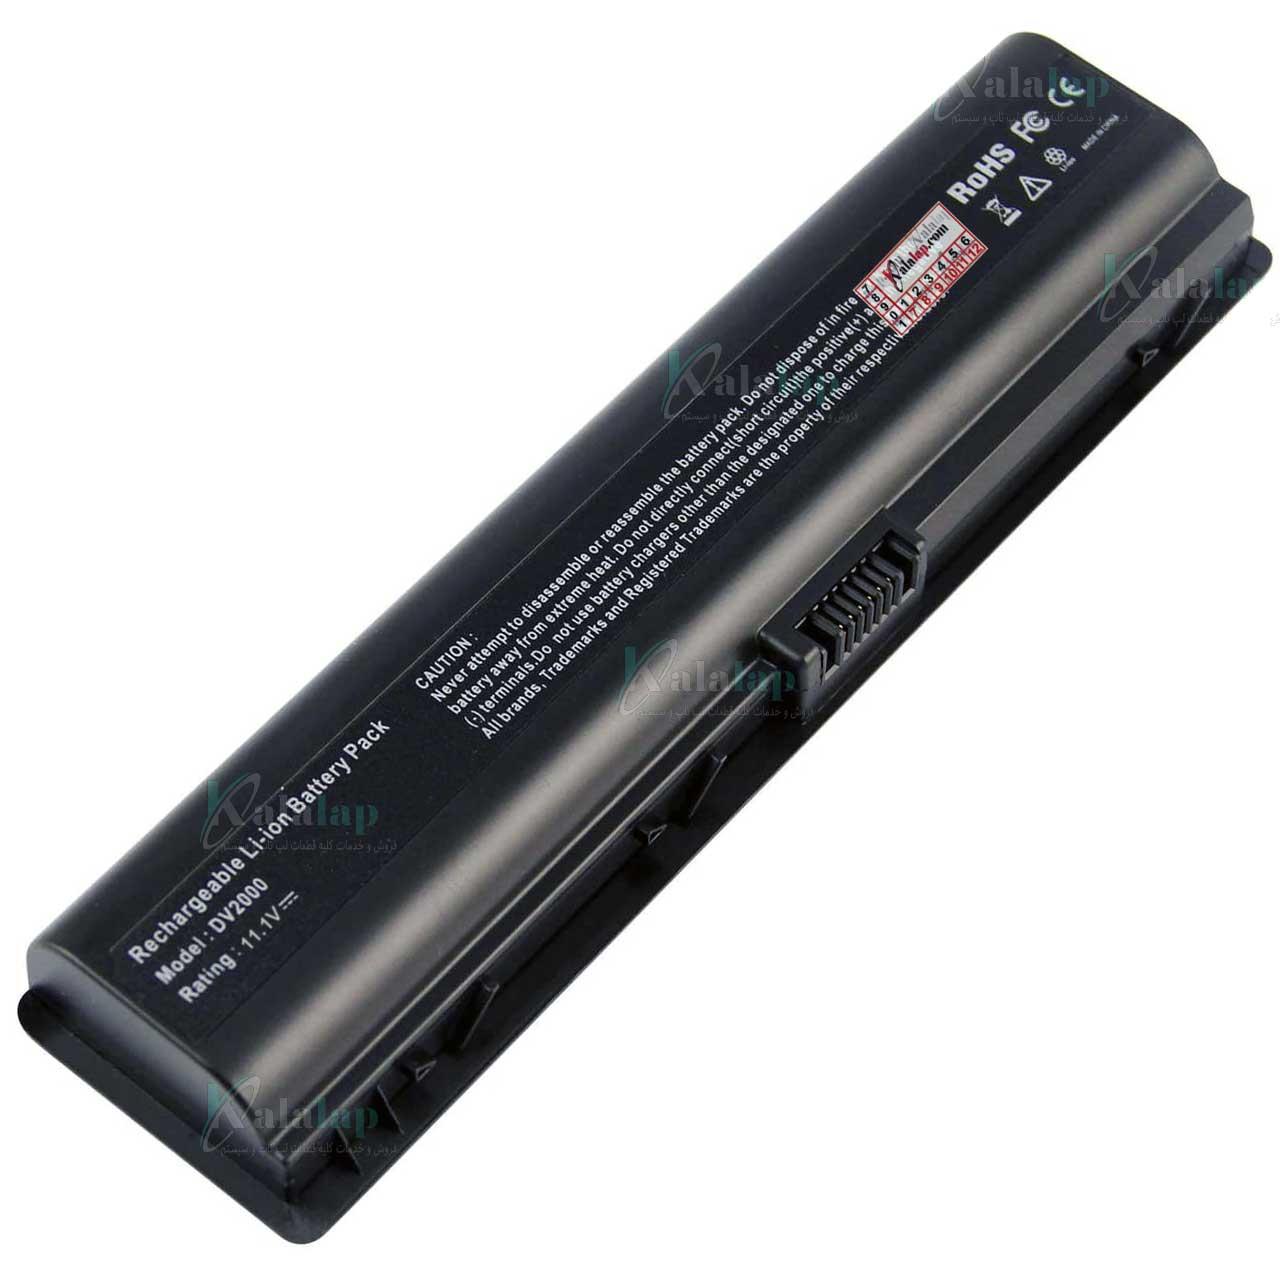 باتری لپ تاپ اچ پی Pavilion DV2000 DV6000